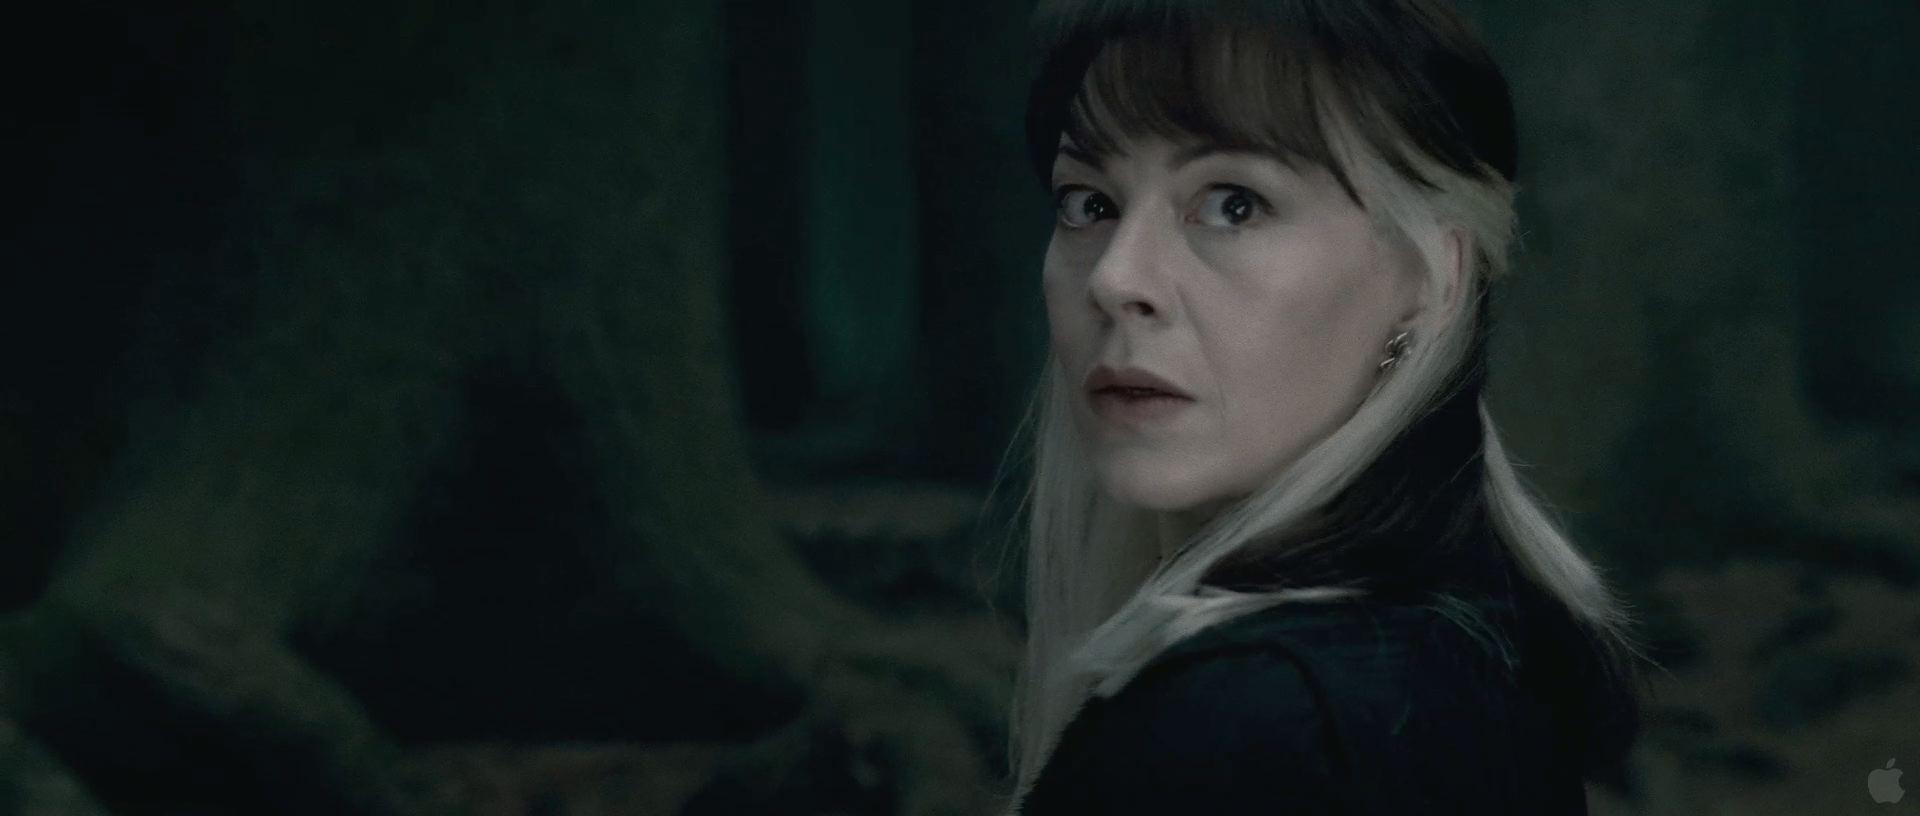 Harry Potter BlogHogwarts HP7 2 Trailer 41